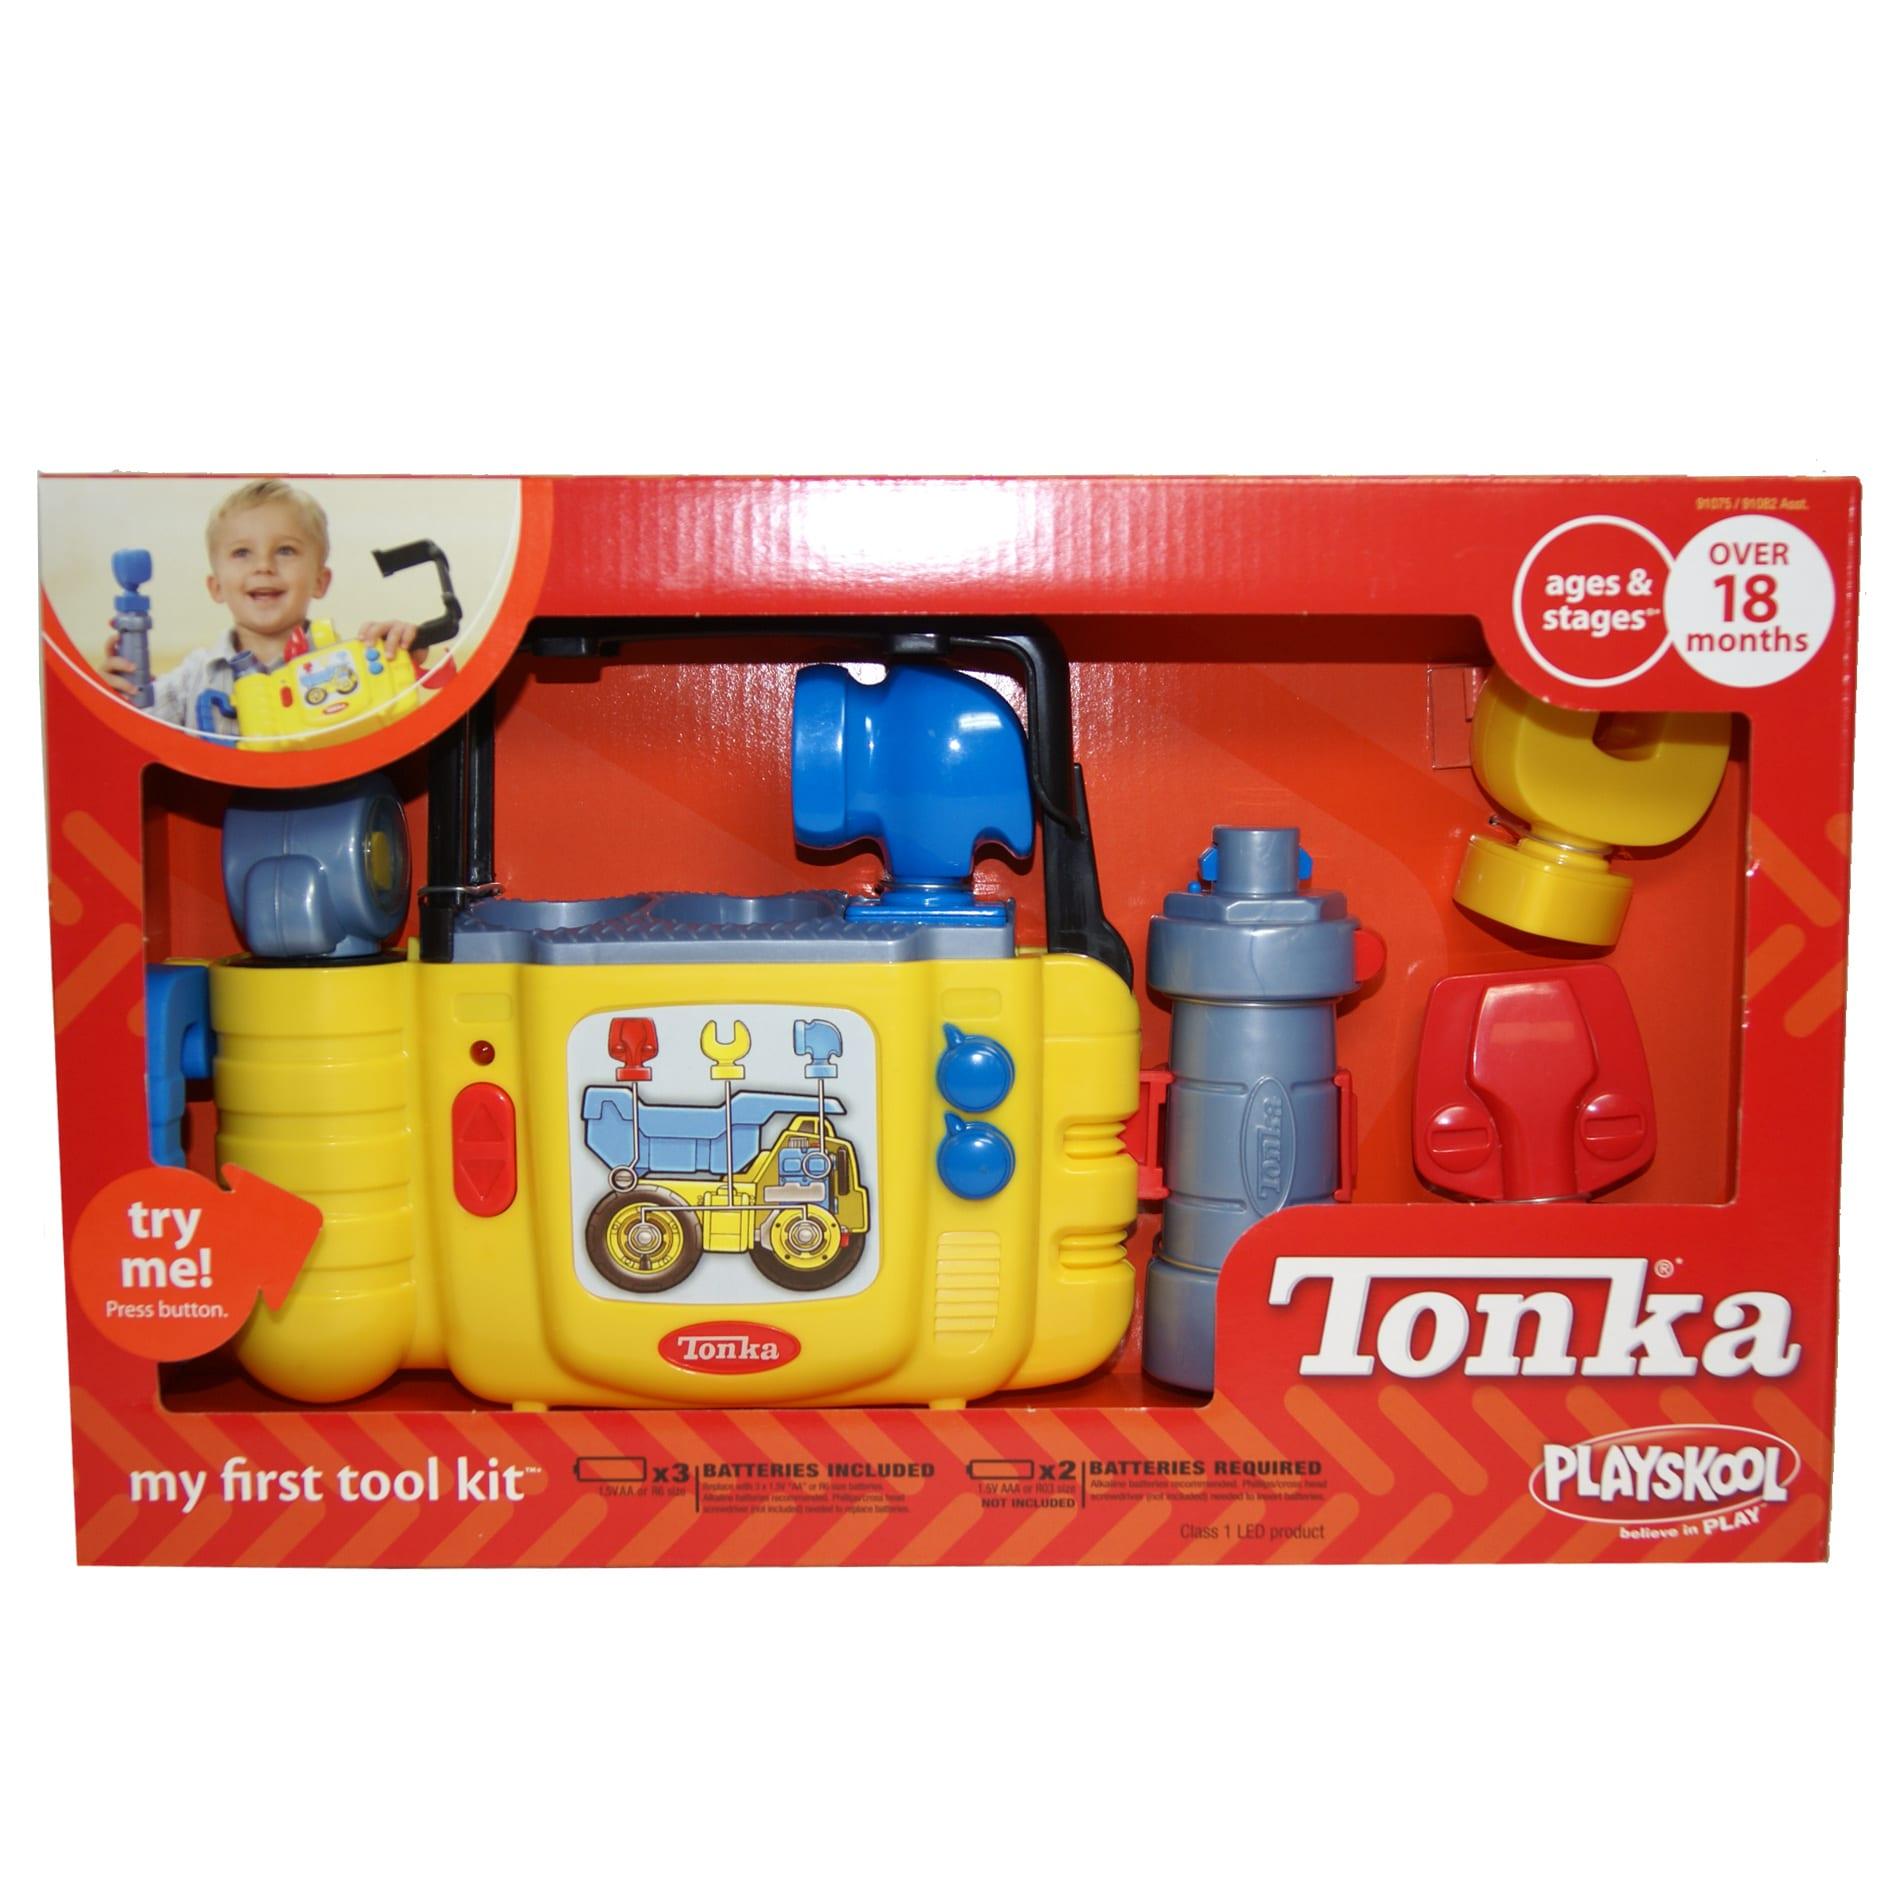 Hasbro Tonka My First Tool Kit